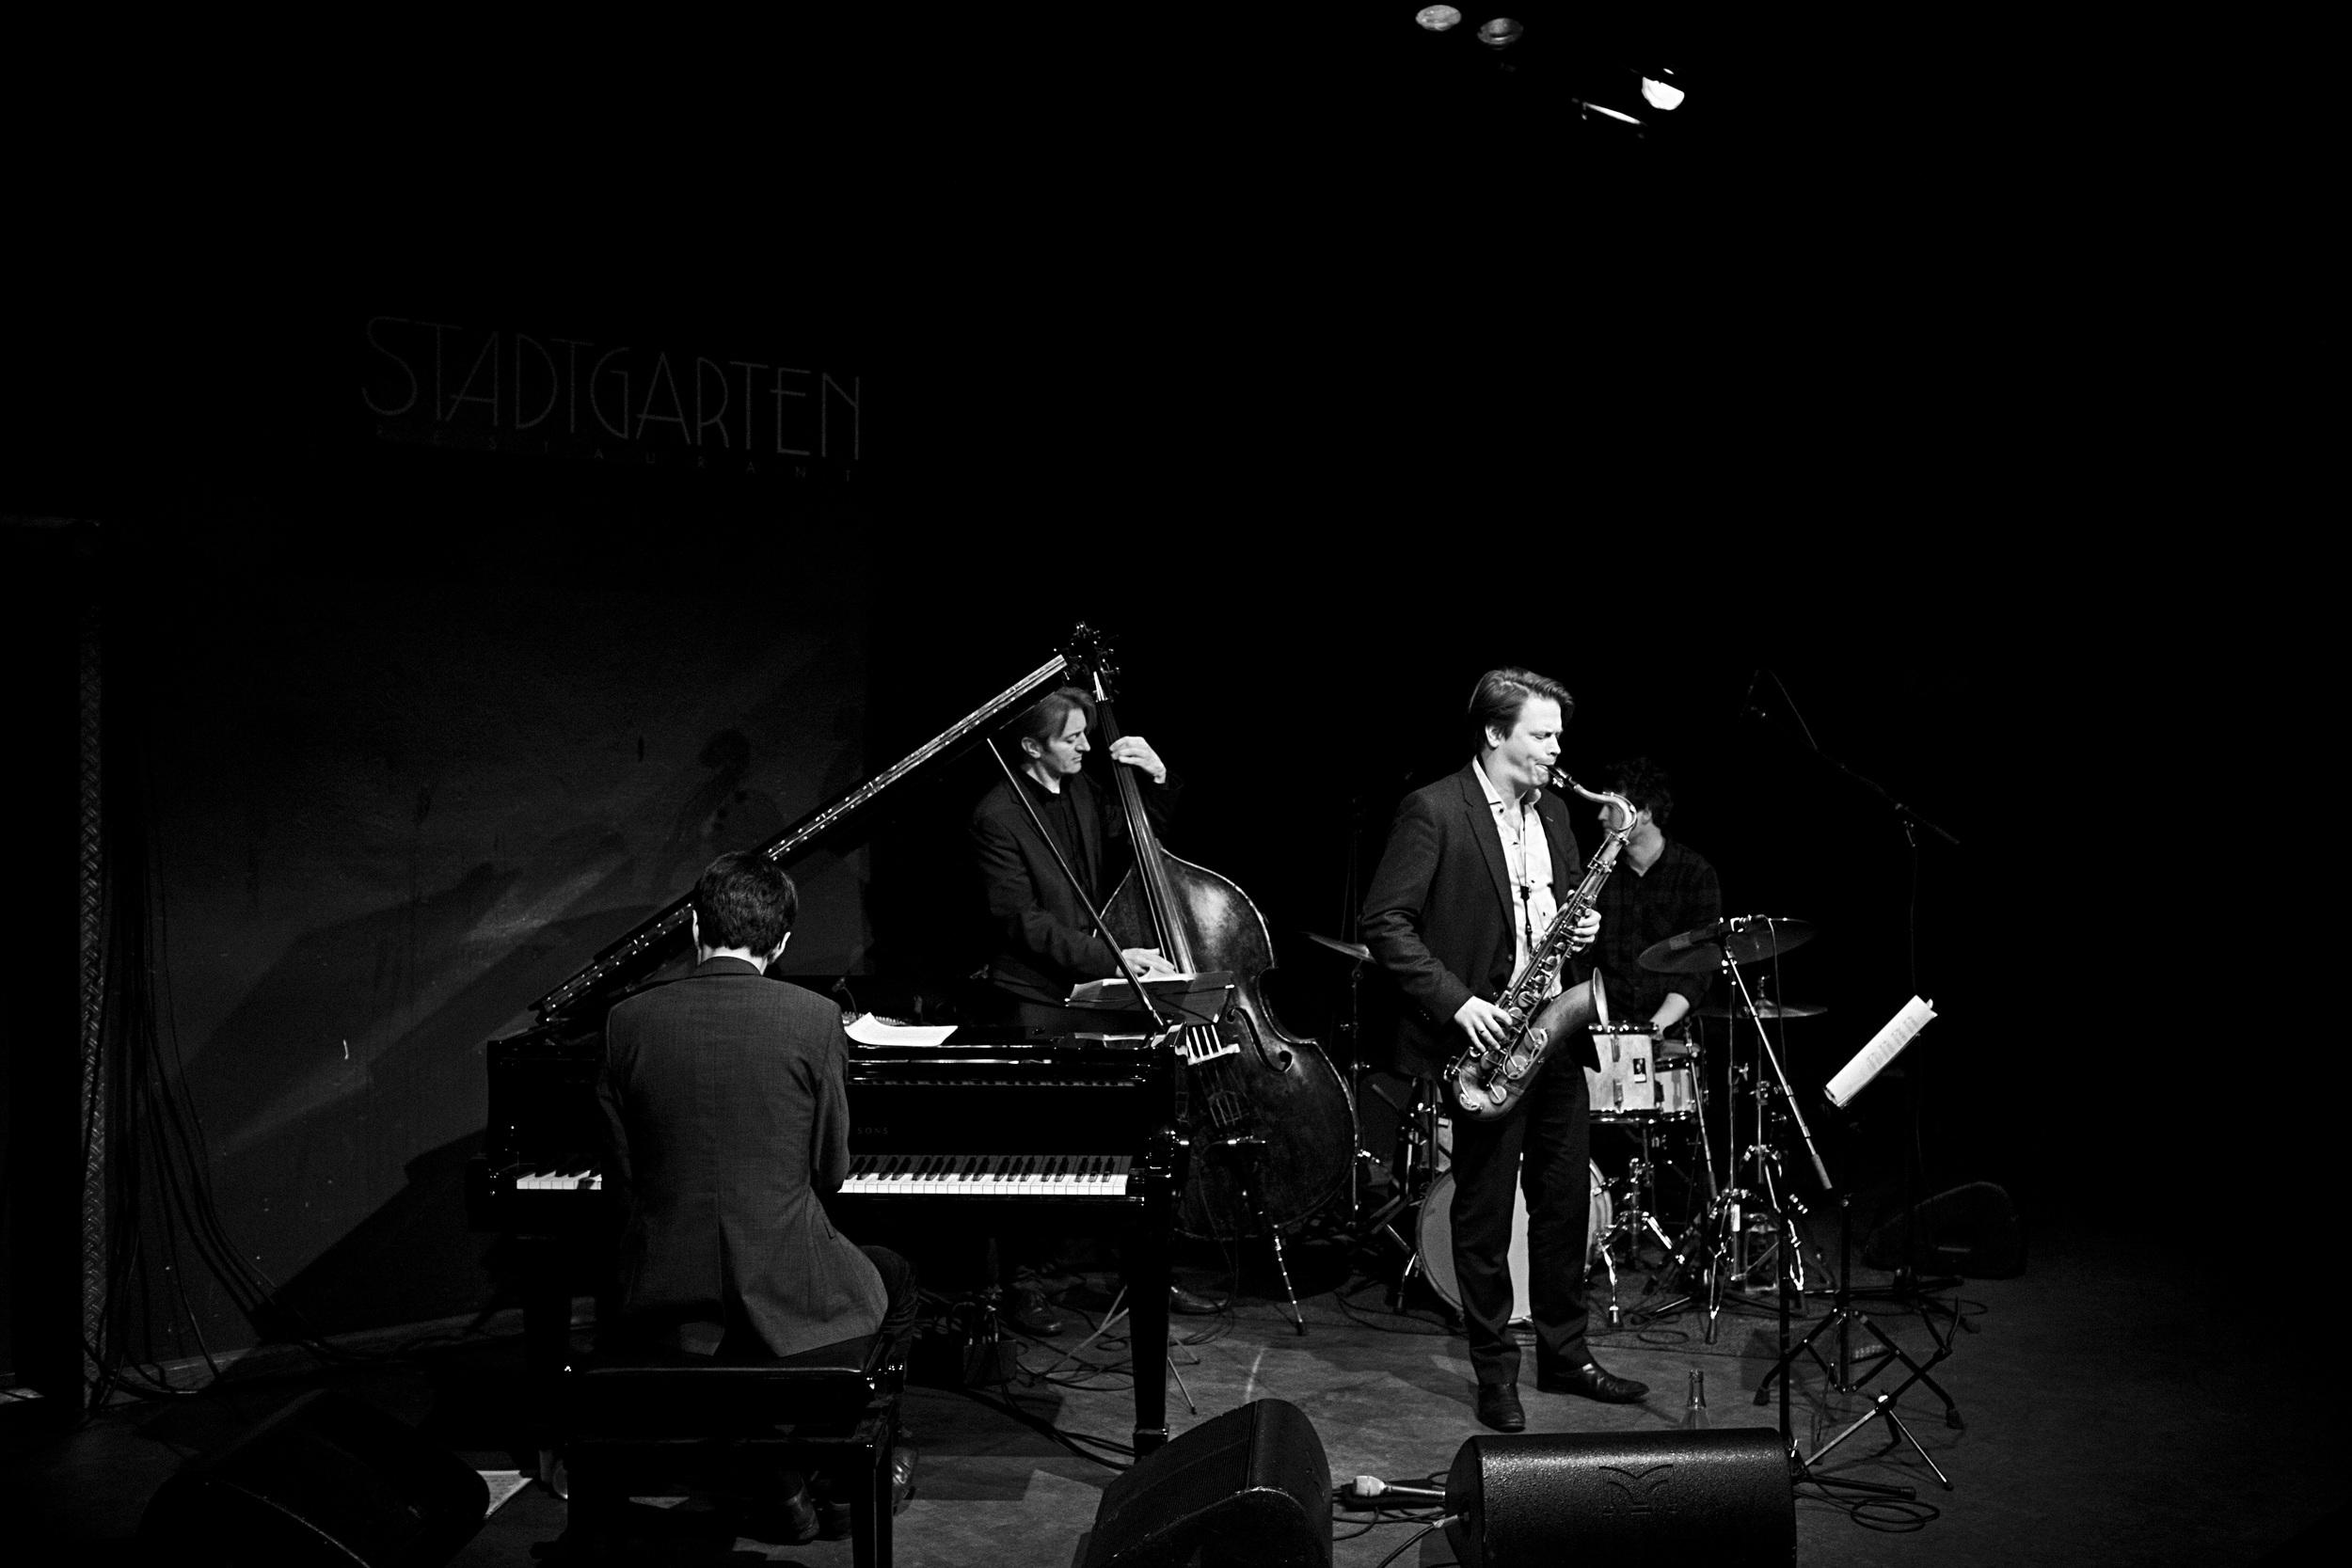 fabian stuertz 2016.02.28 - denis gäbel quartet - stadtgarten 0007-bw.jpg